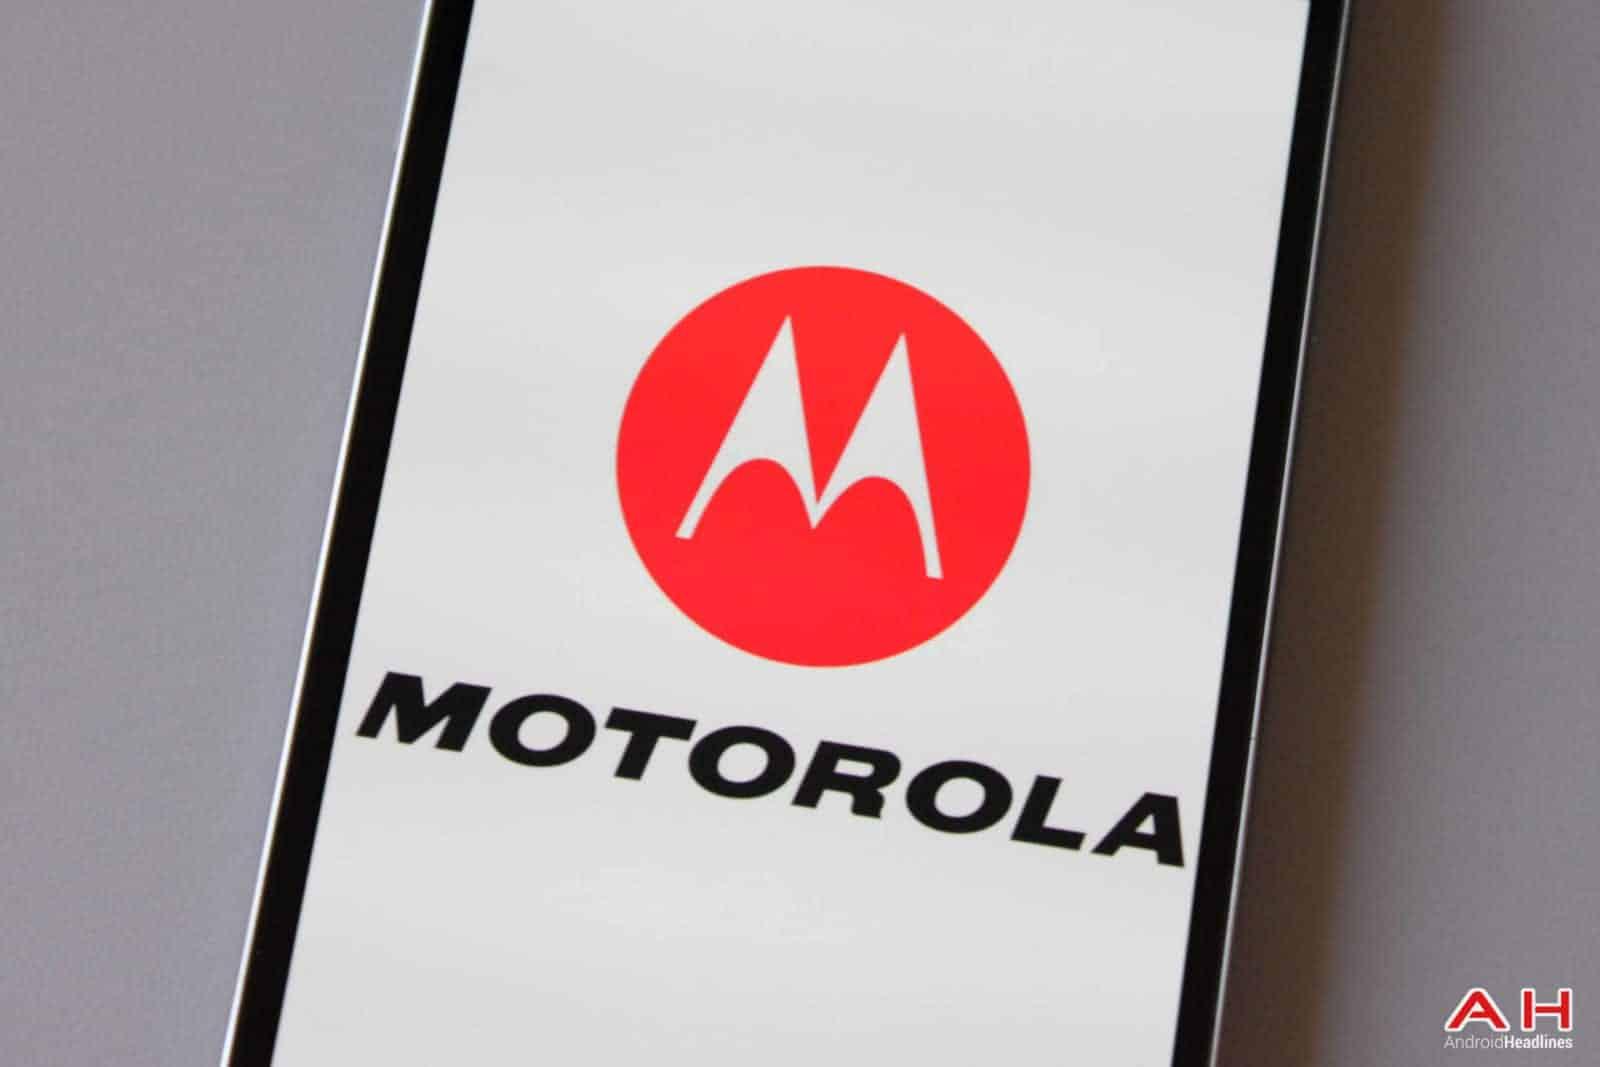 AH Motorola Logo 1.1